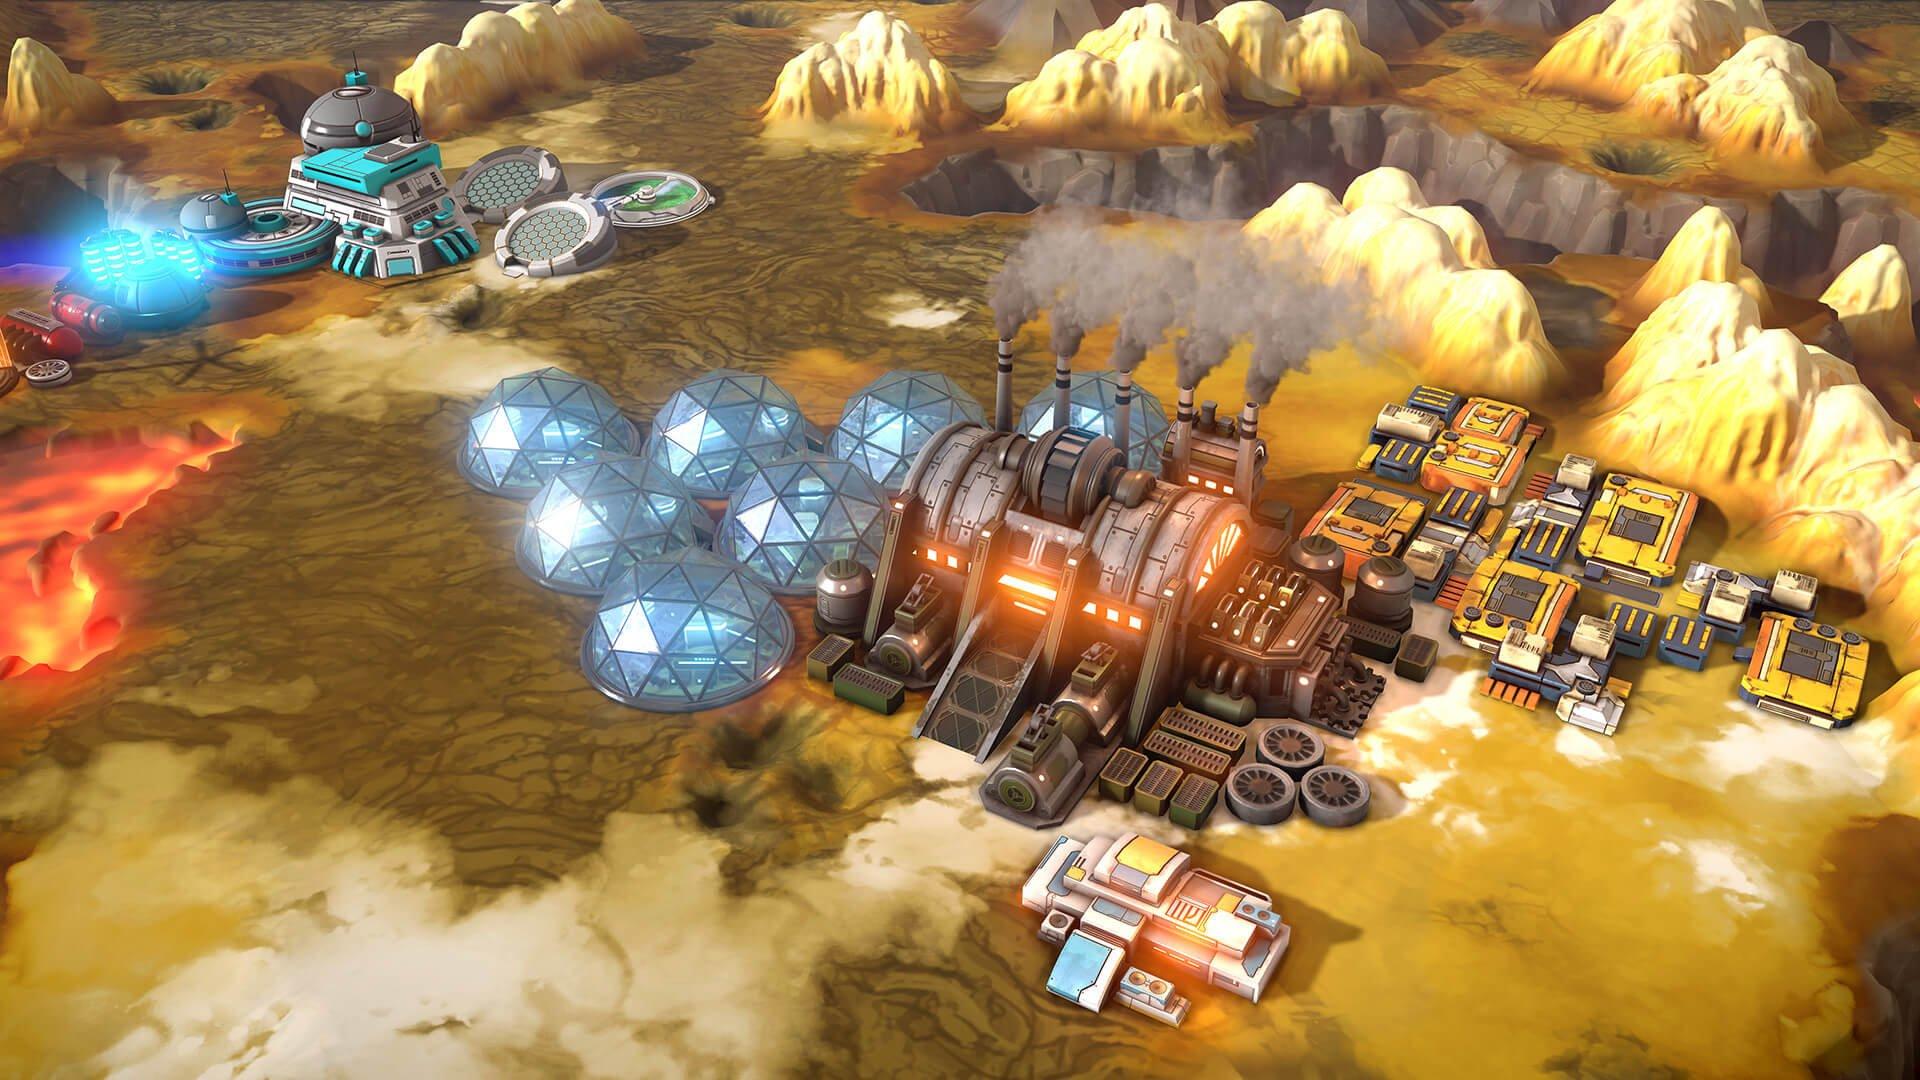 Offworld Trading Company: Jupiter's Forge